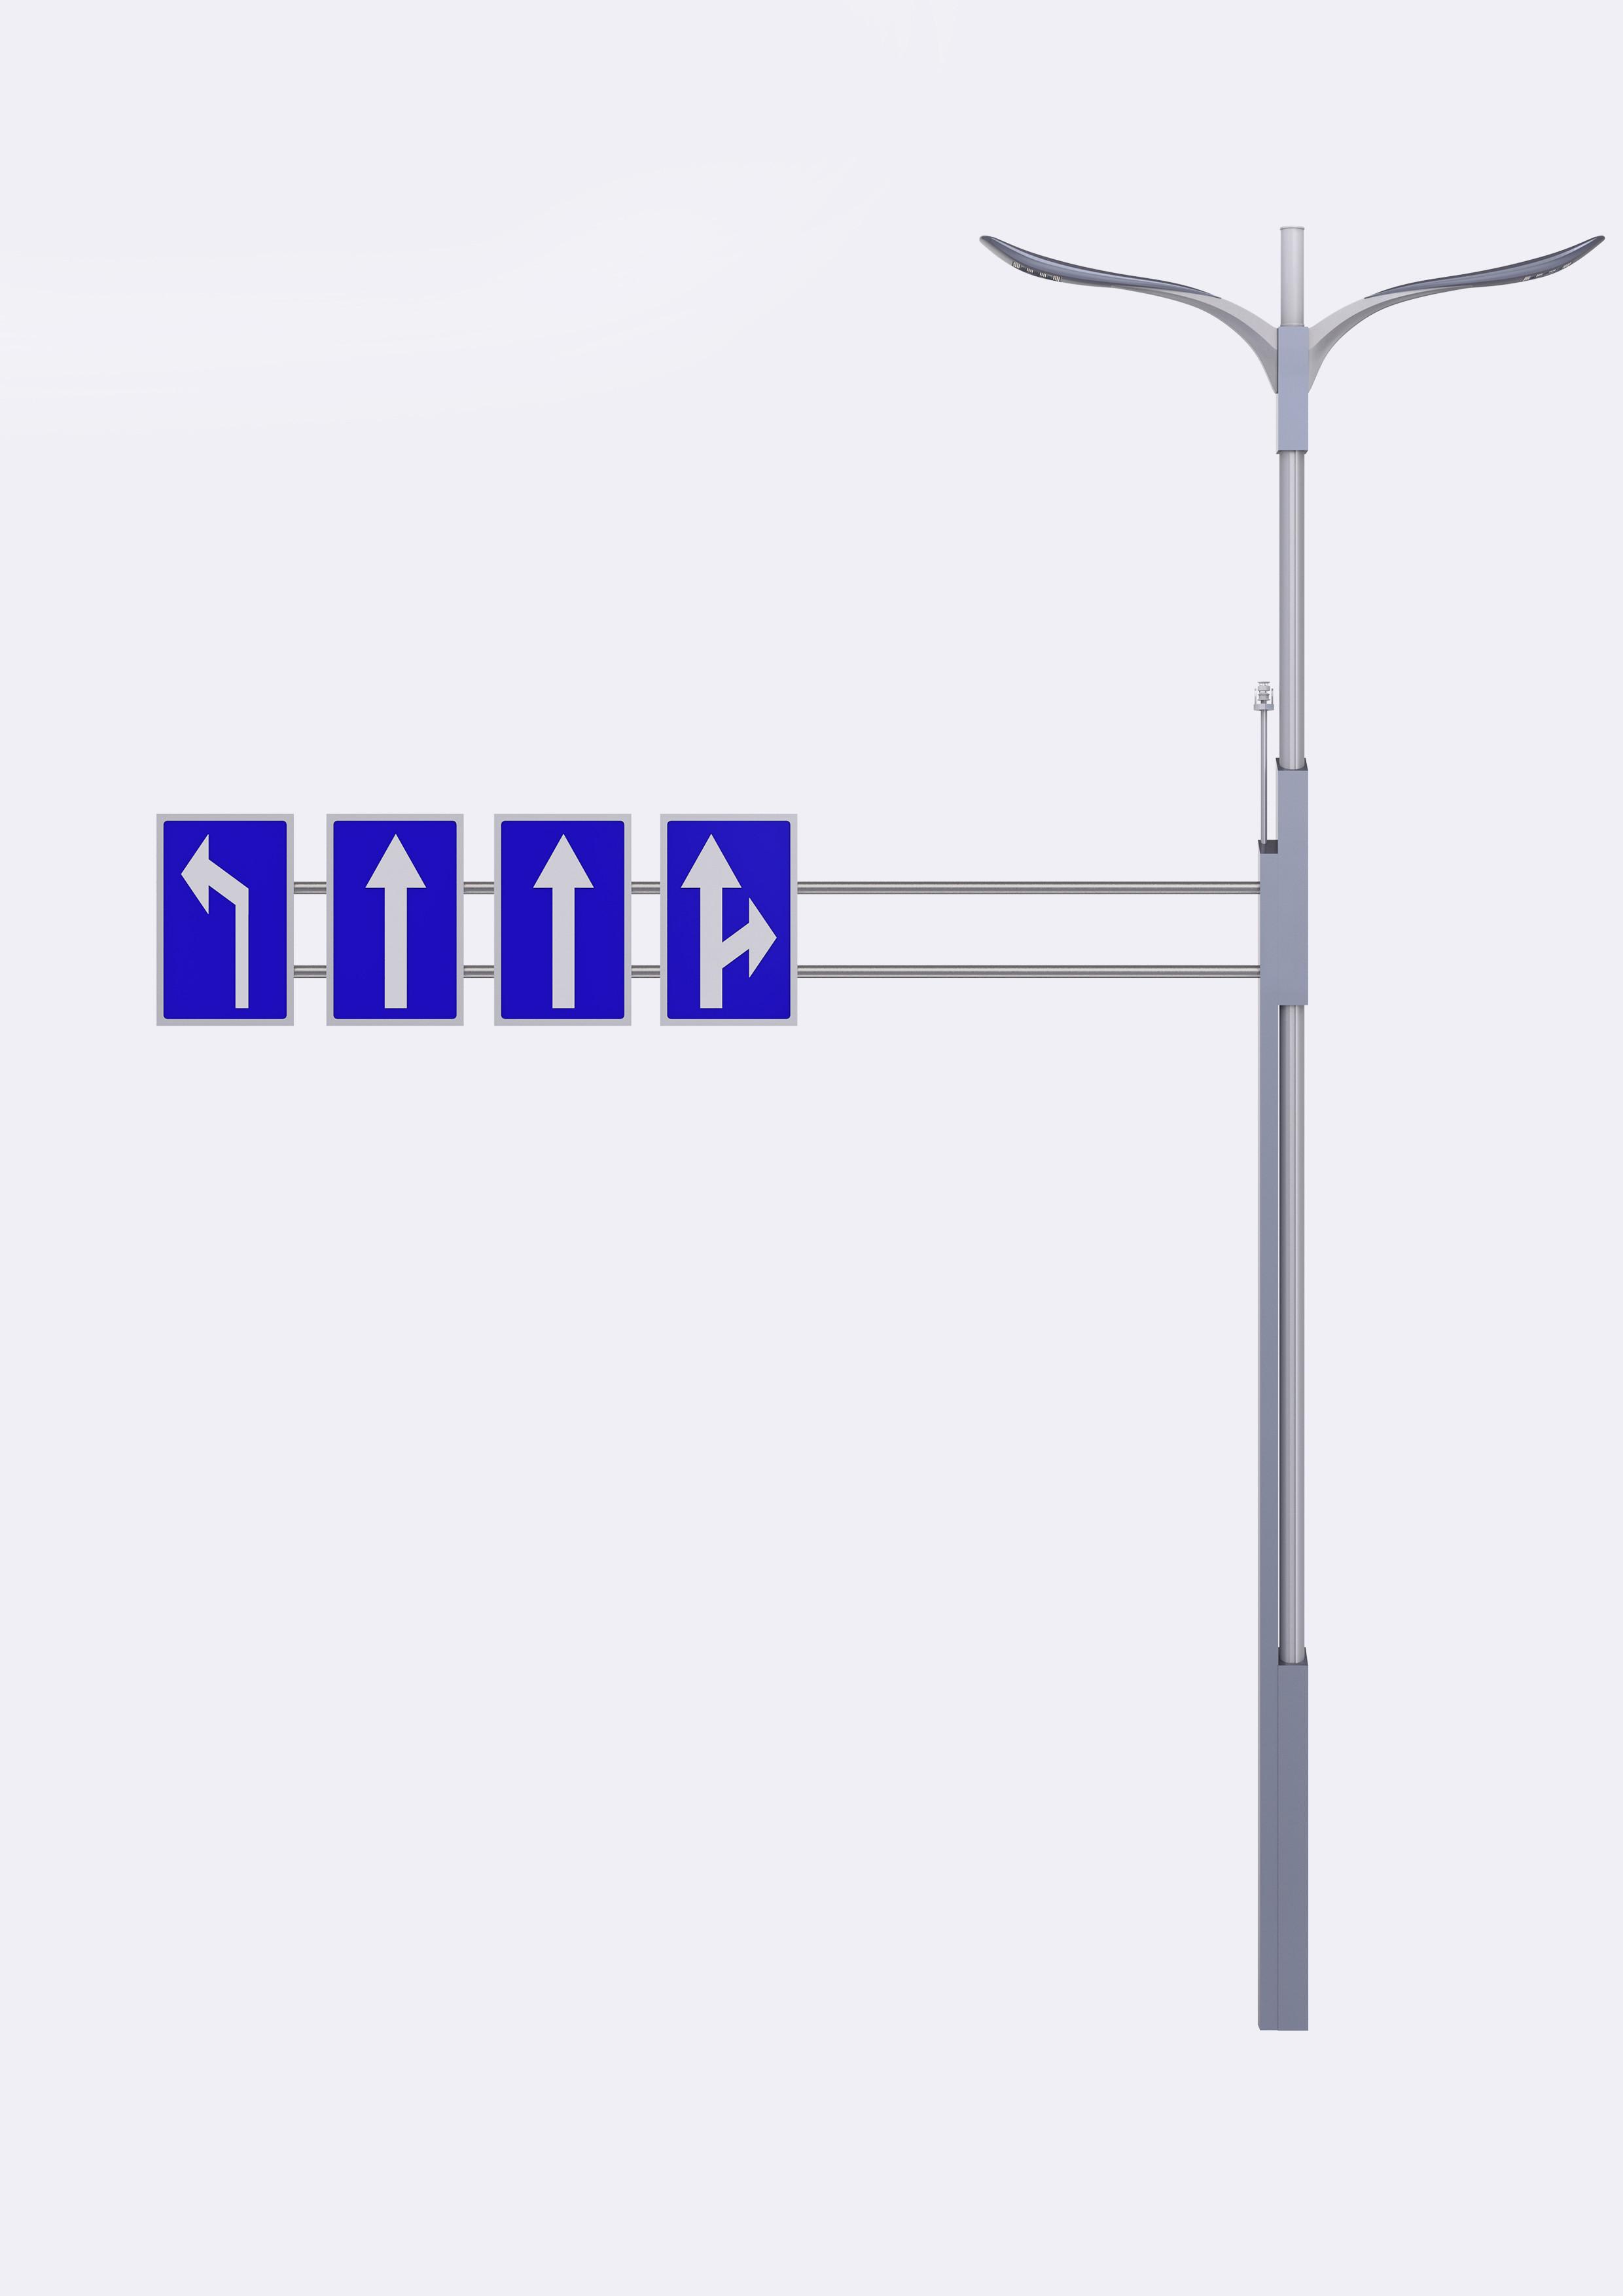 <b>海鸥型BoB全球体育投注平台灯杆</b>